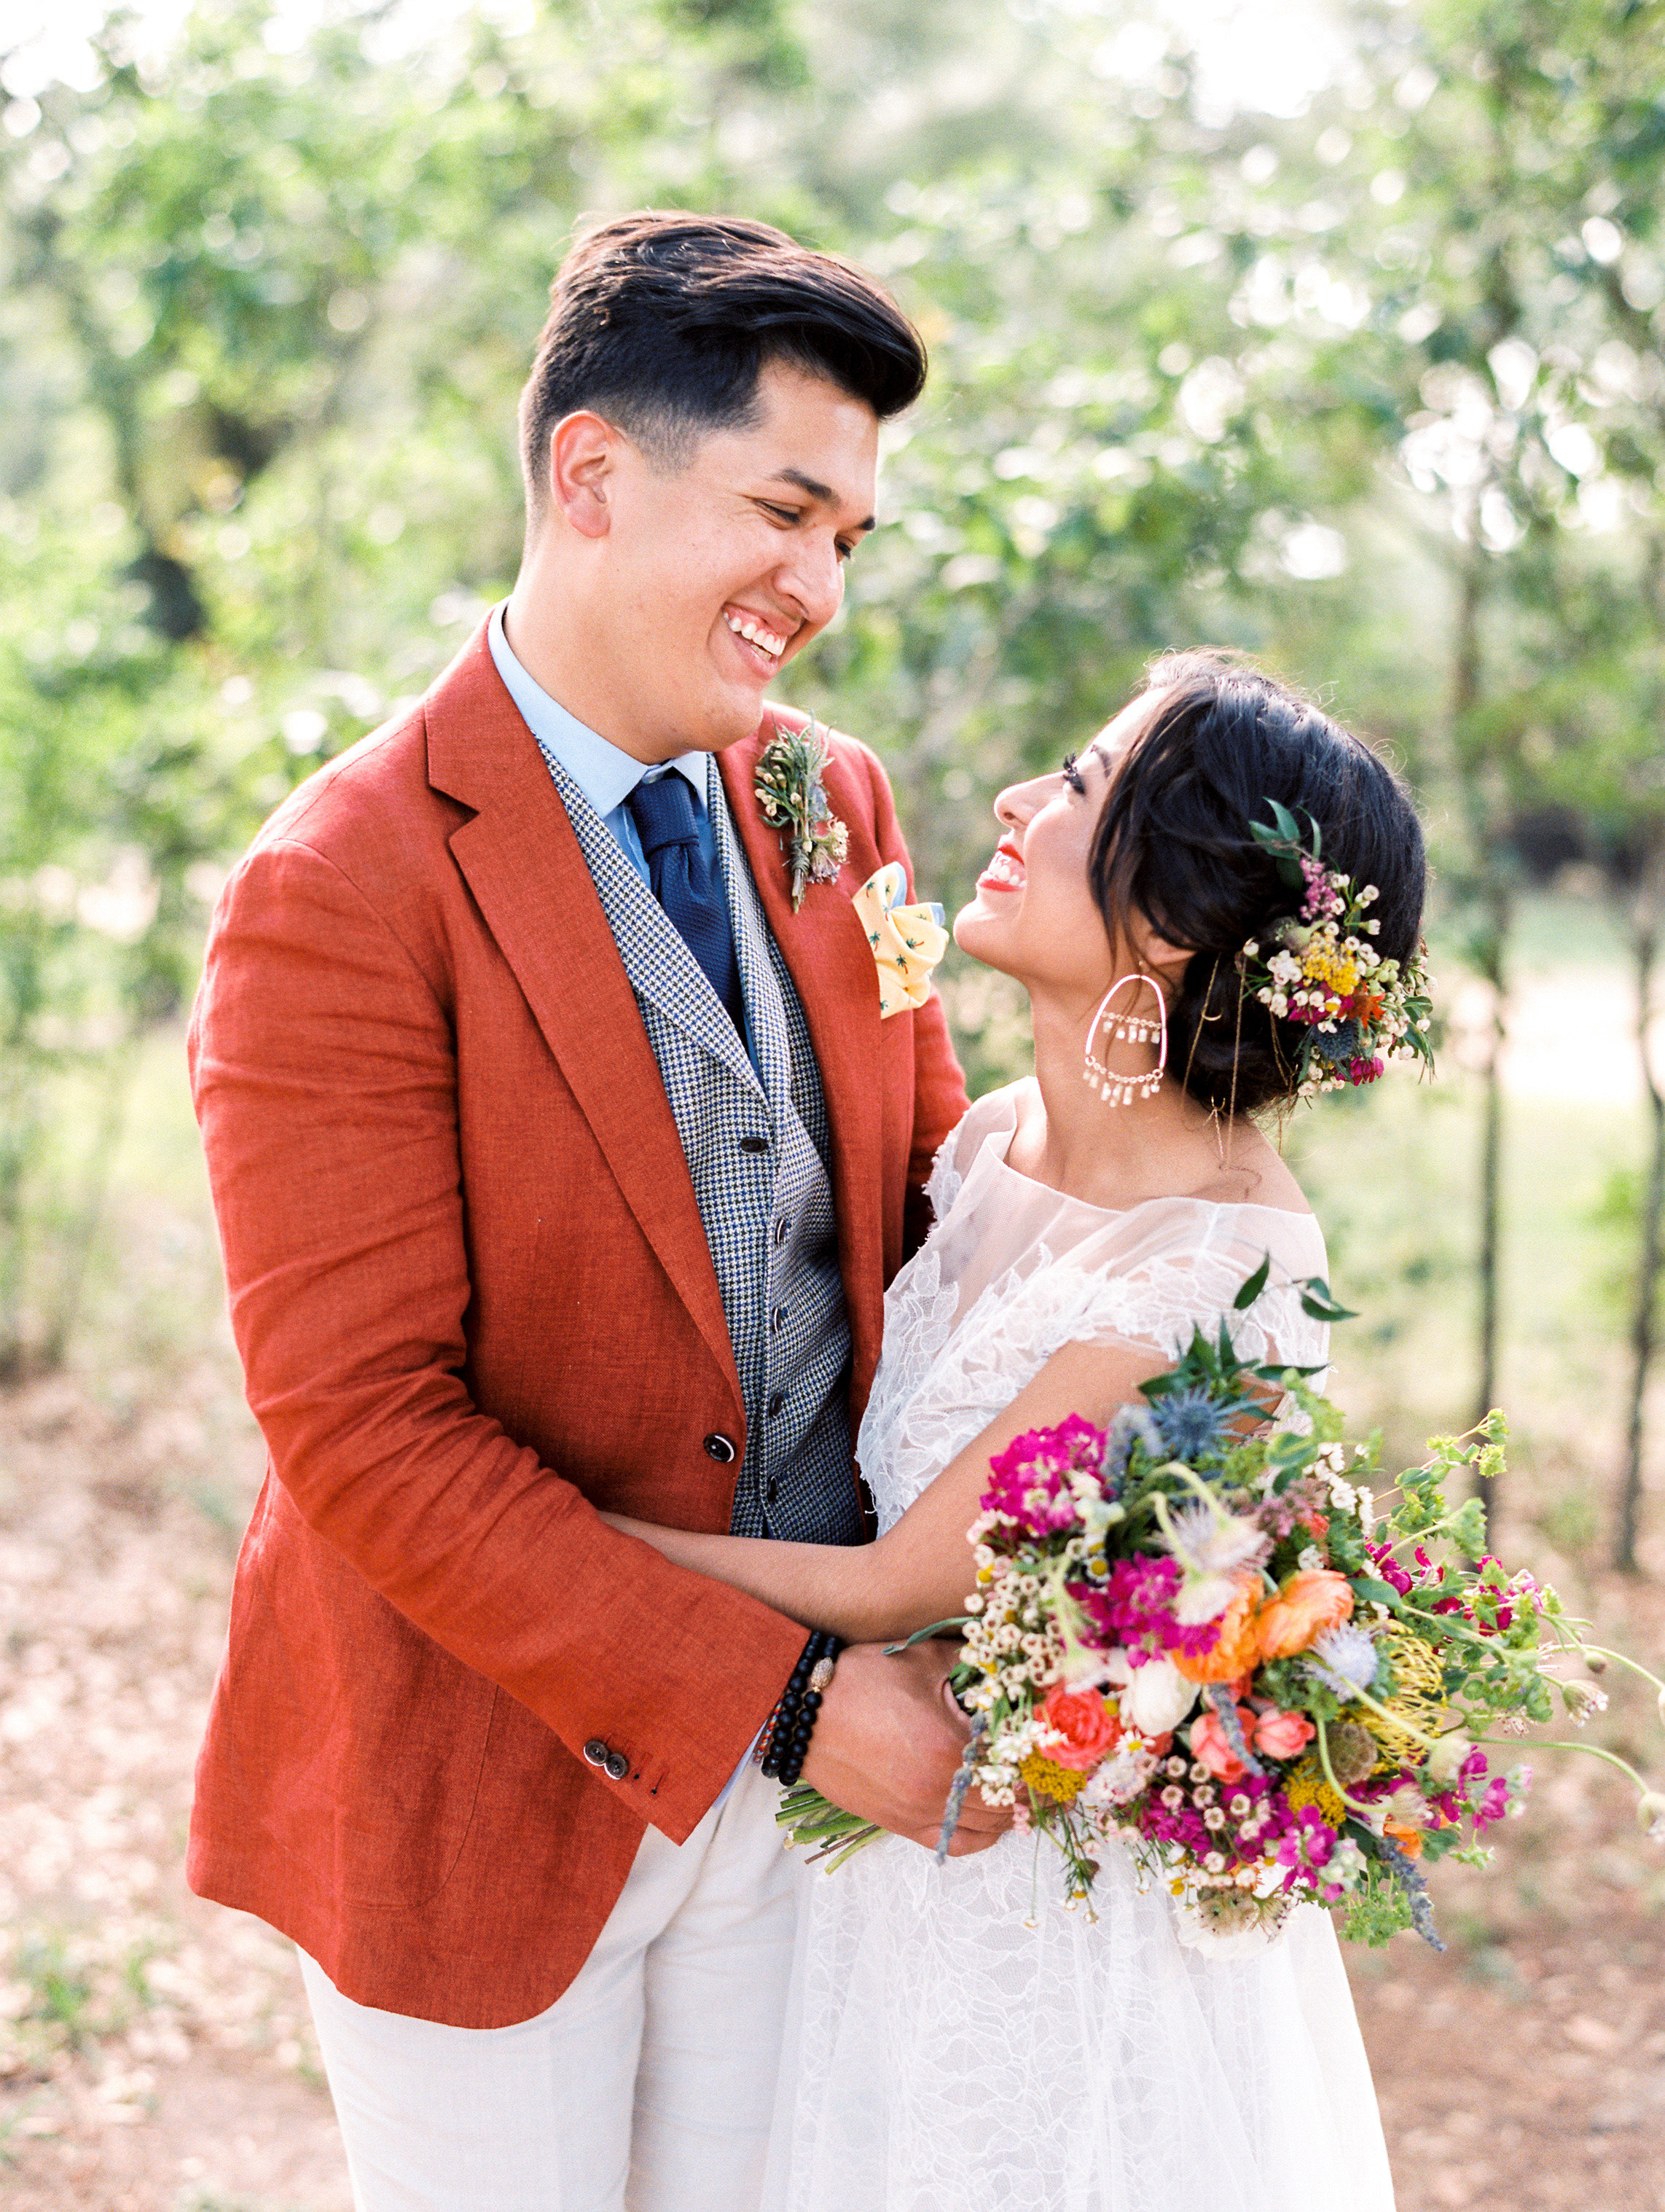 Dana-Fernandez-Photography-Martha-Stewart-Weddings-Houston-Texas-Wedding-Photographer-Film-21.jpg